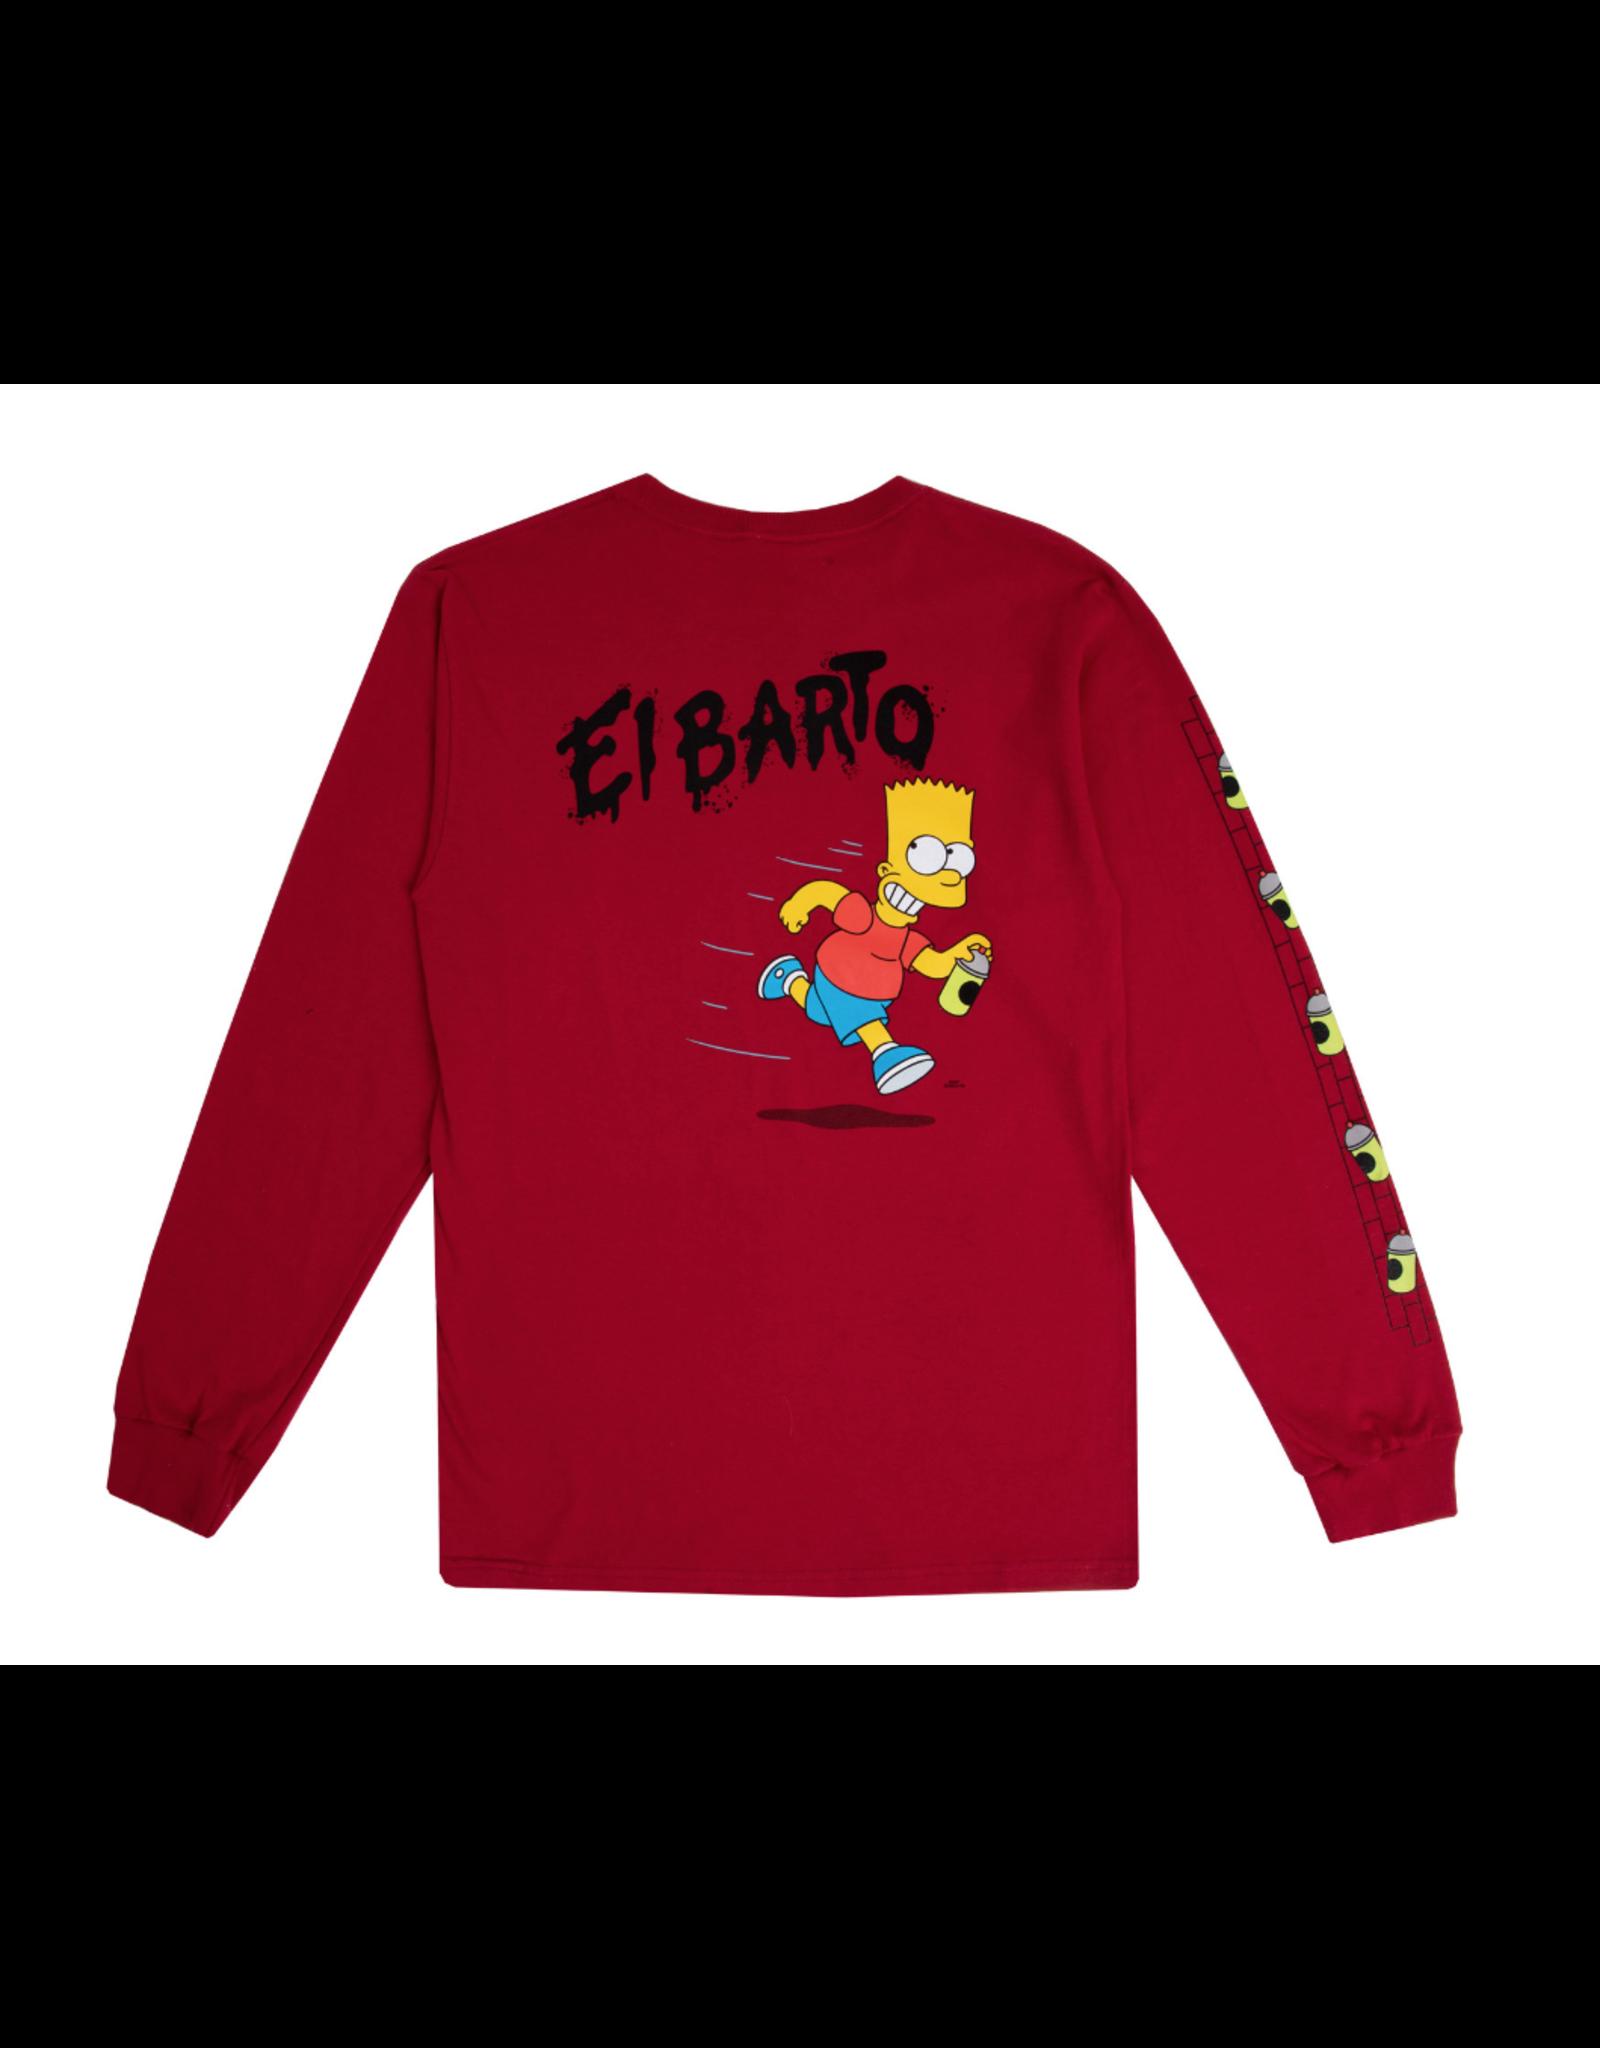 Vans The Simpsons El Barto T-Shirt - Red